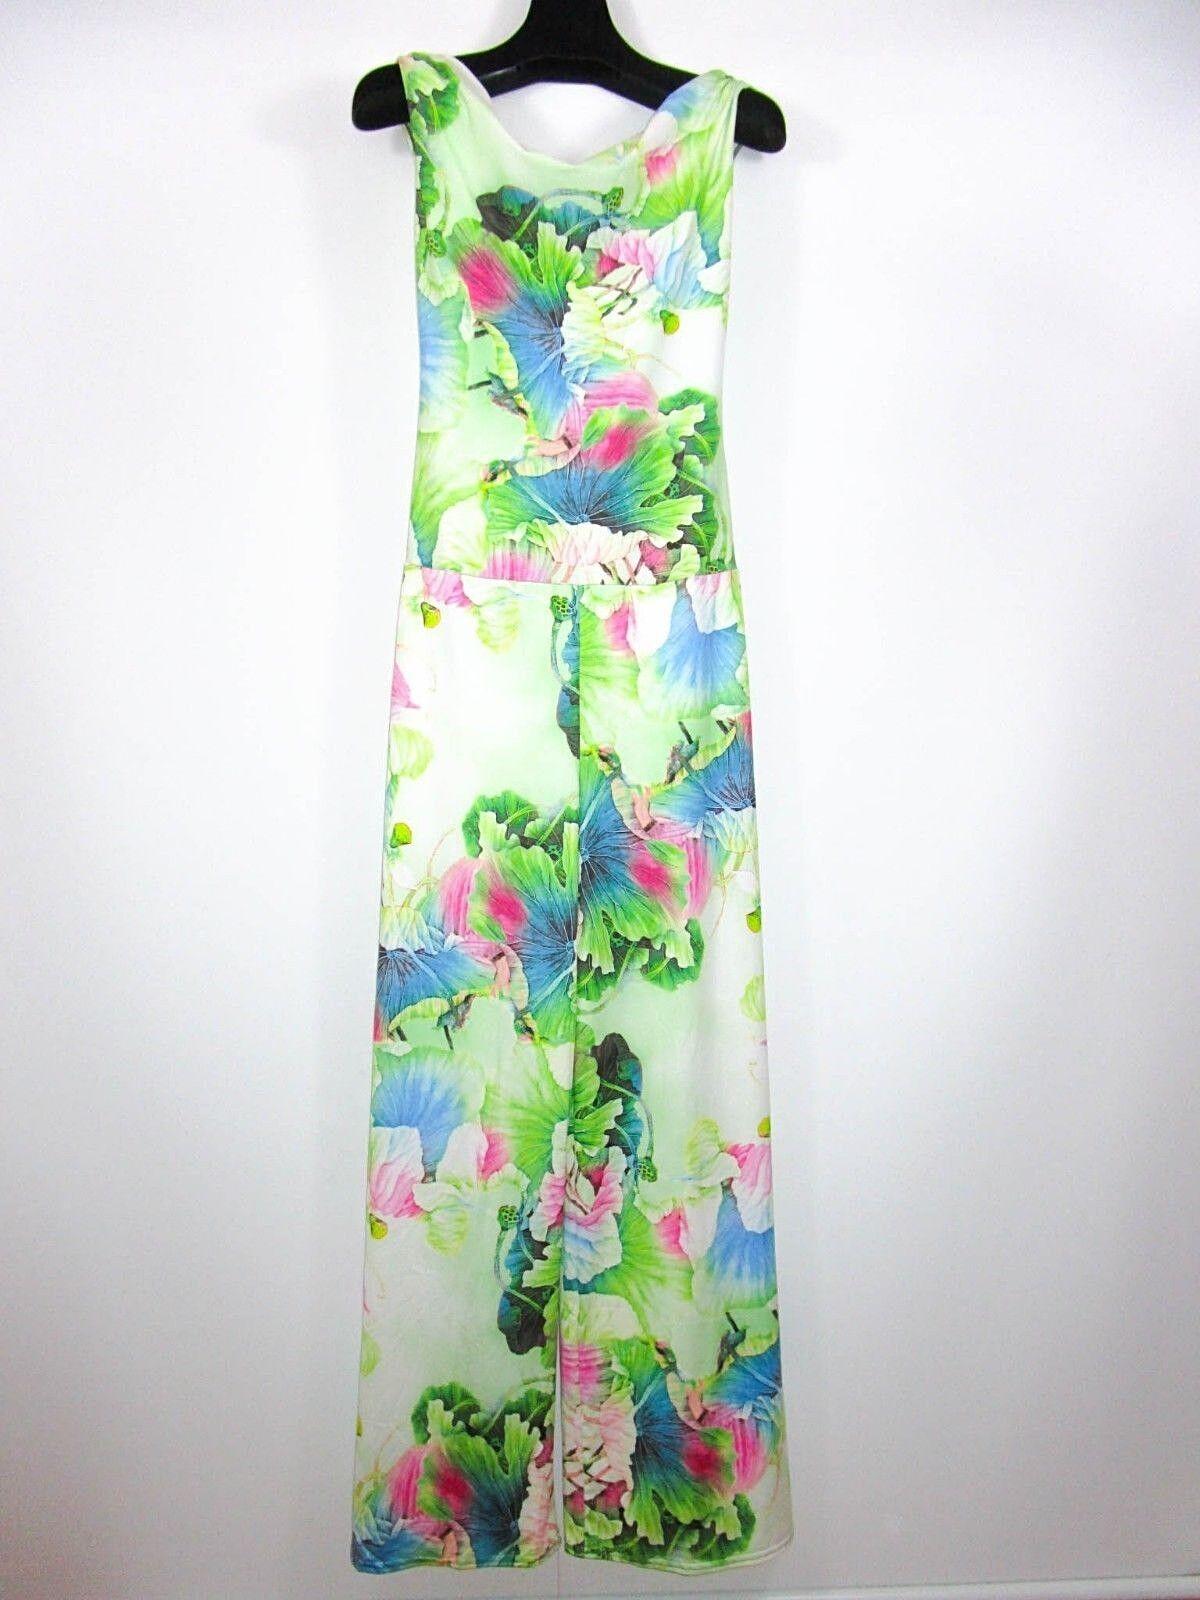 Women's Vtg Retro 90s Green Floral Print Boho Hippy Romper Jumpsuit sz L XL BI4